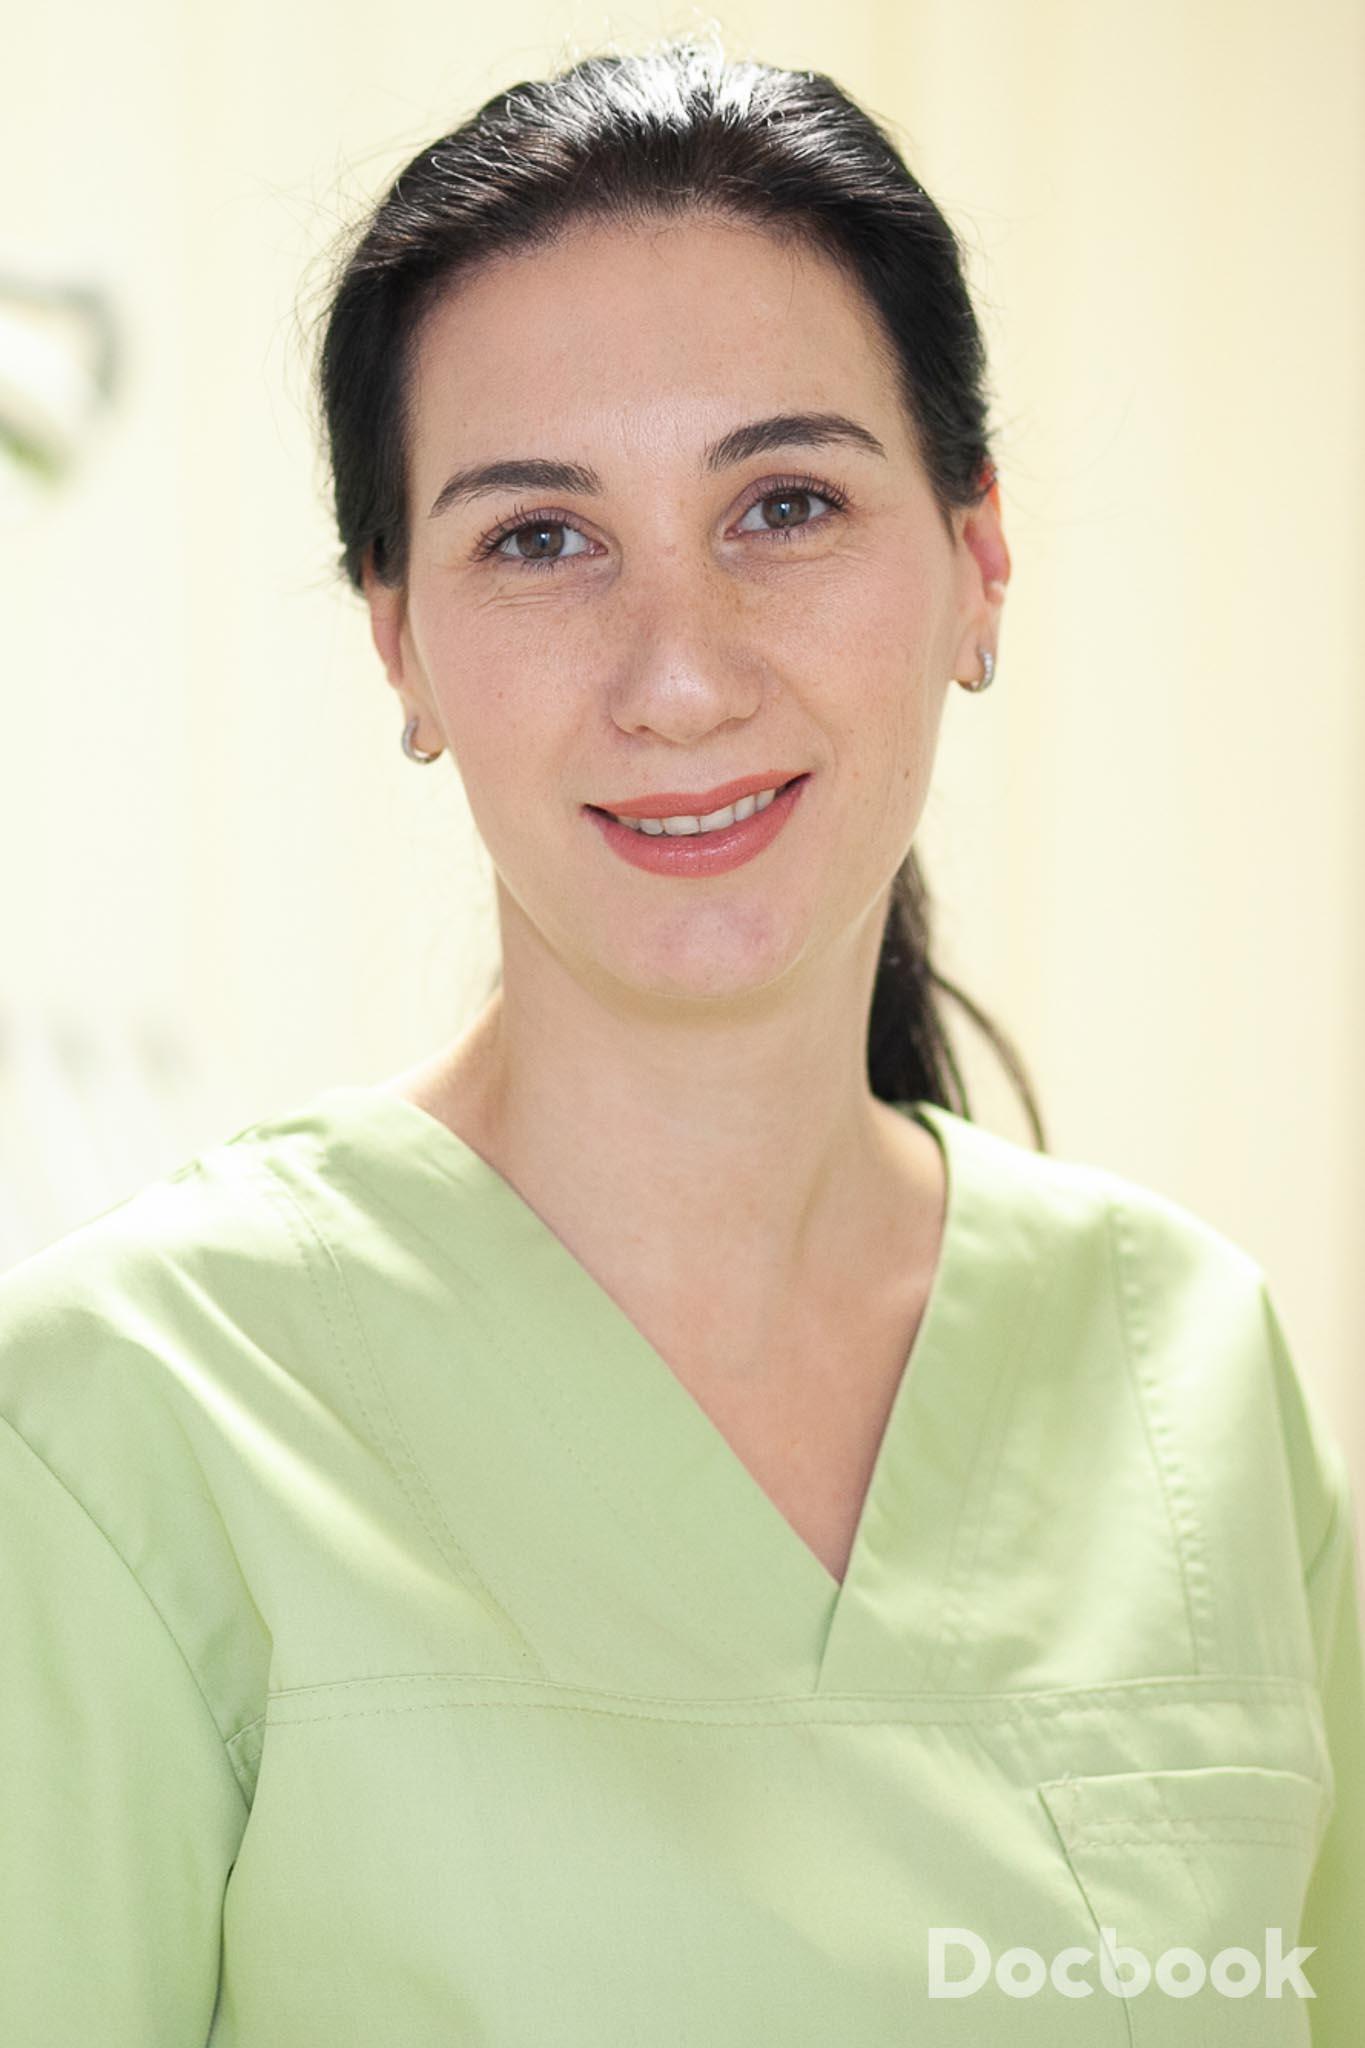 Dr. Baltag Ruxandra